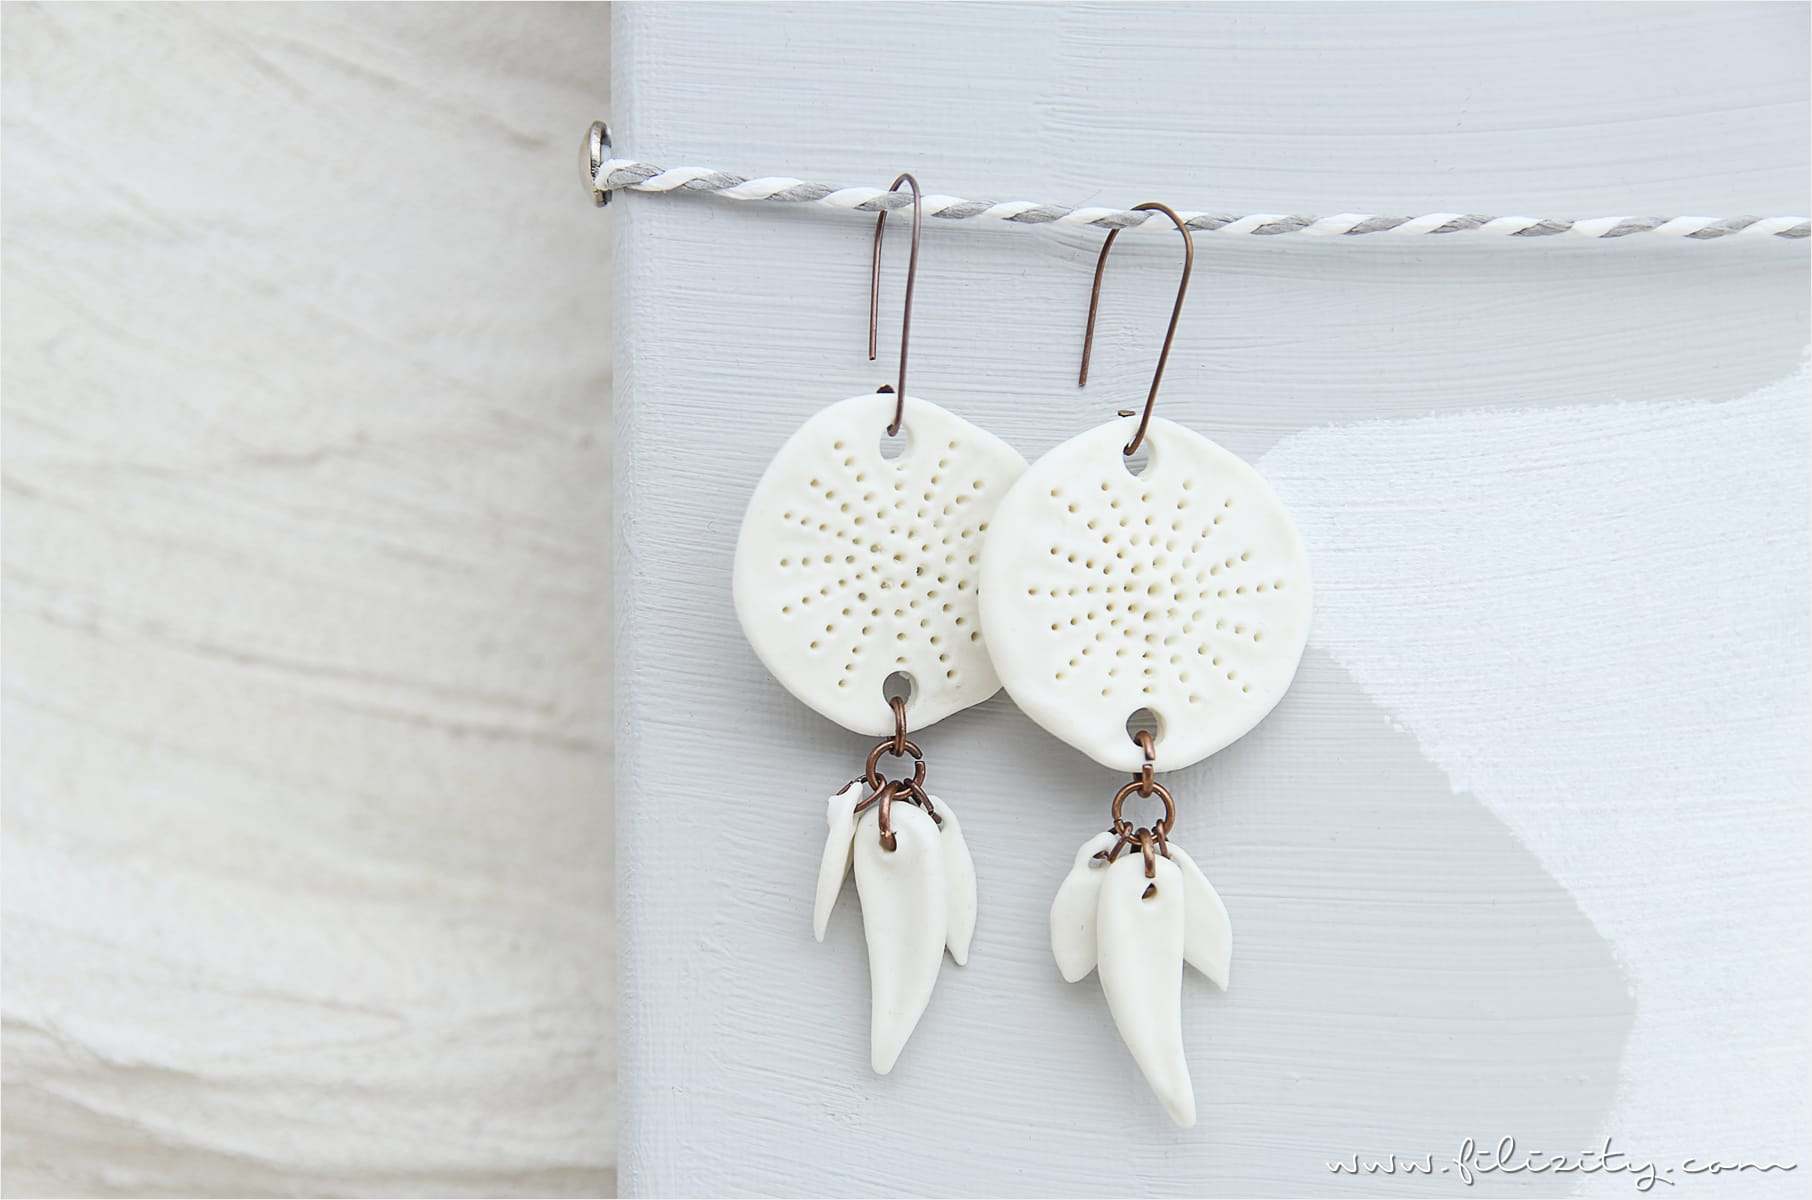 Kaltporzellan-Ohrringe im Boho-Style selber machen